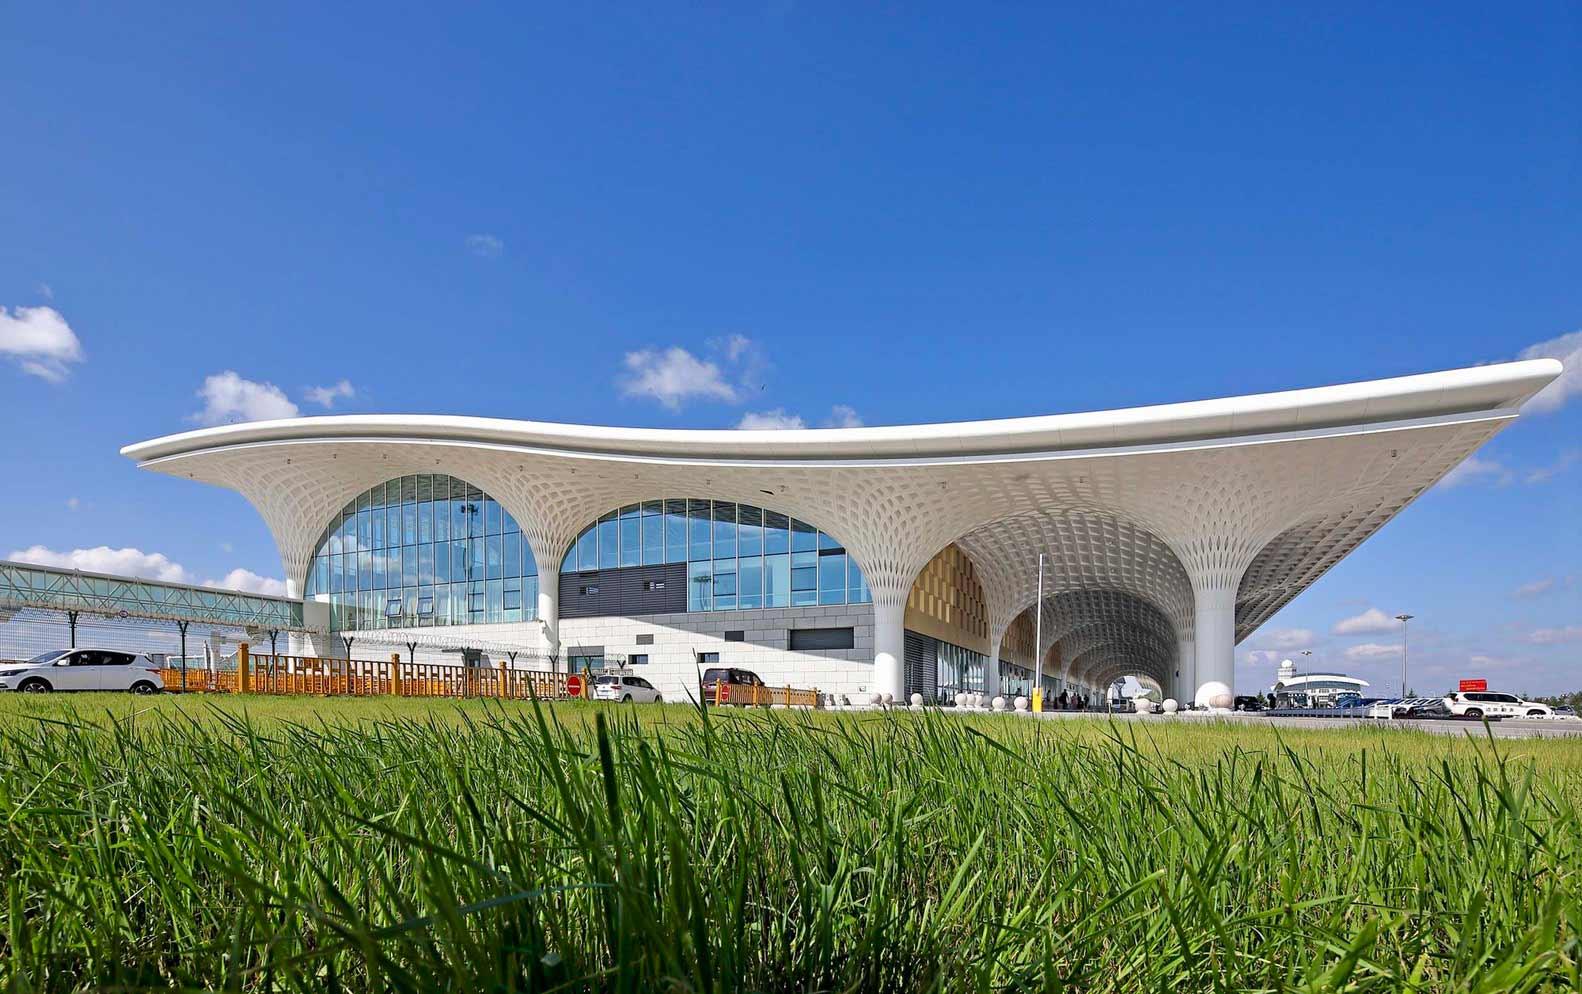 Hulunbuir Hailar Airport